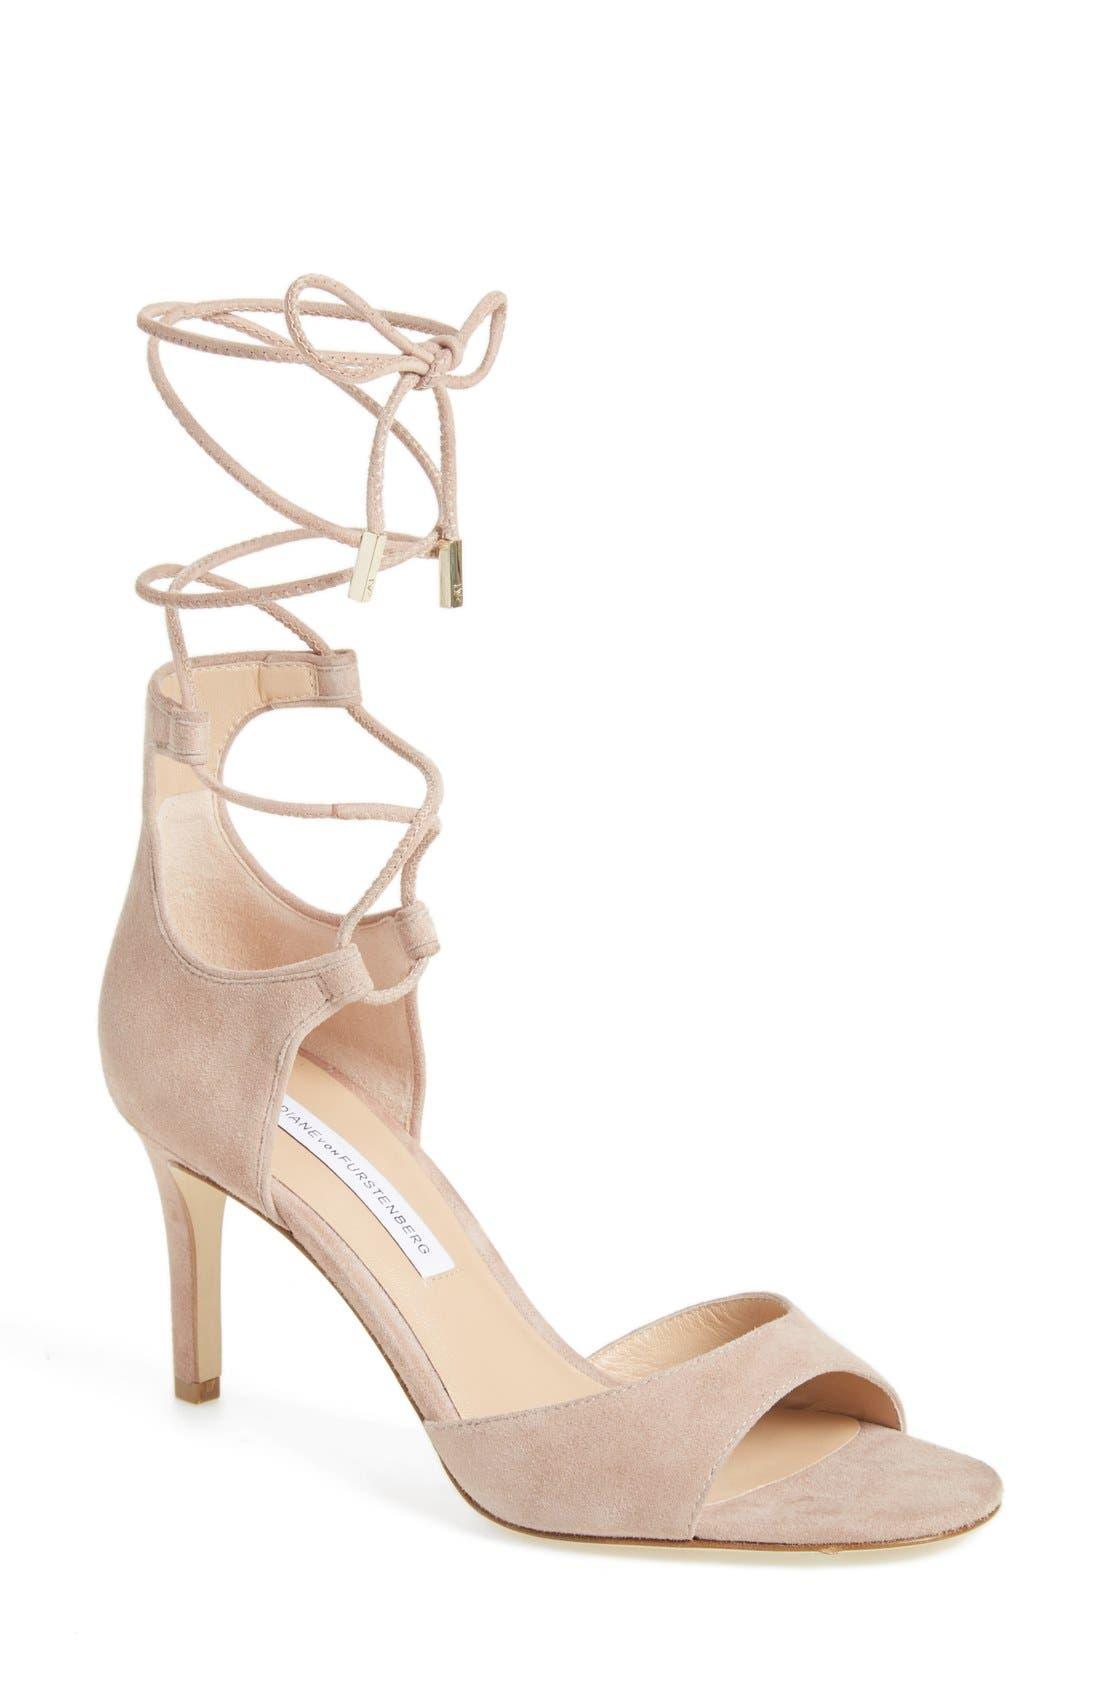 Main Image - Diane von Furstenberg 'Rimini' Ankle Wrap Sandal (Women)